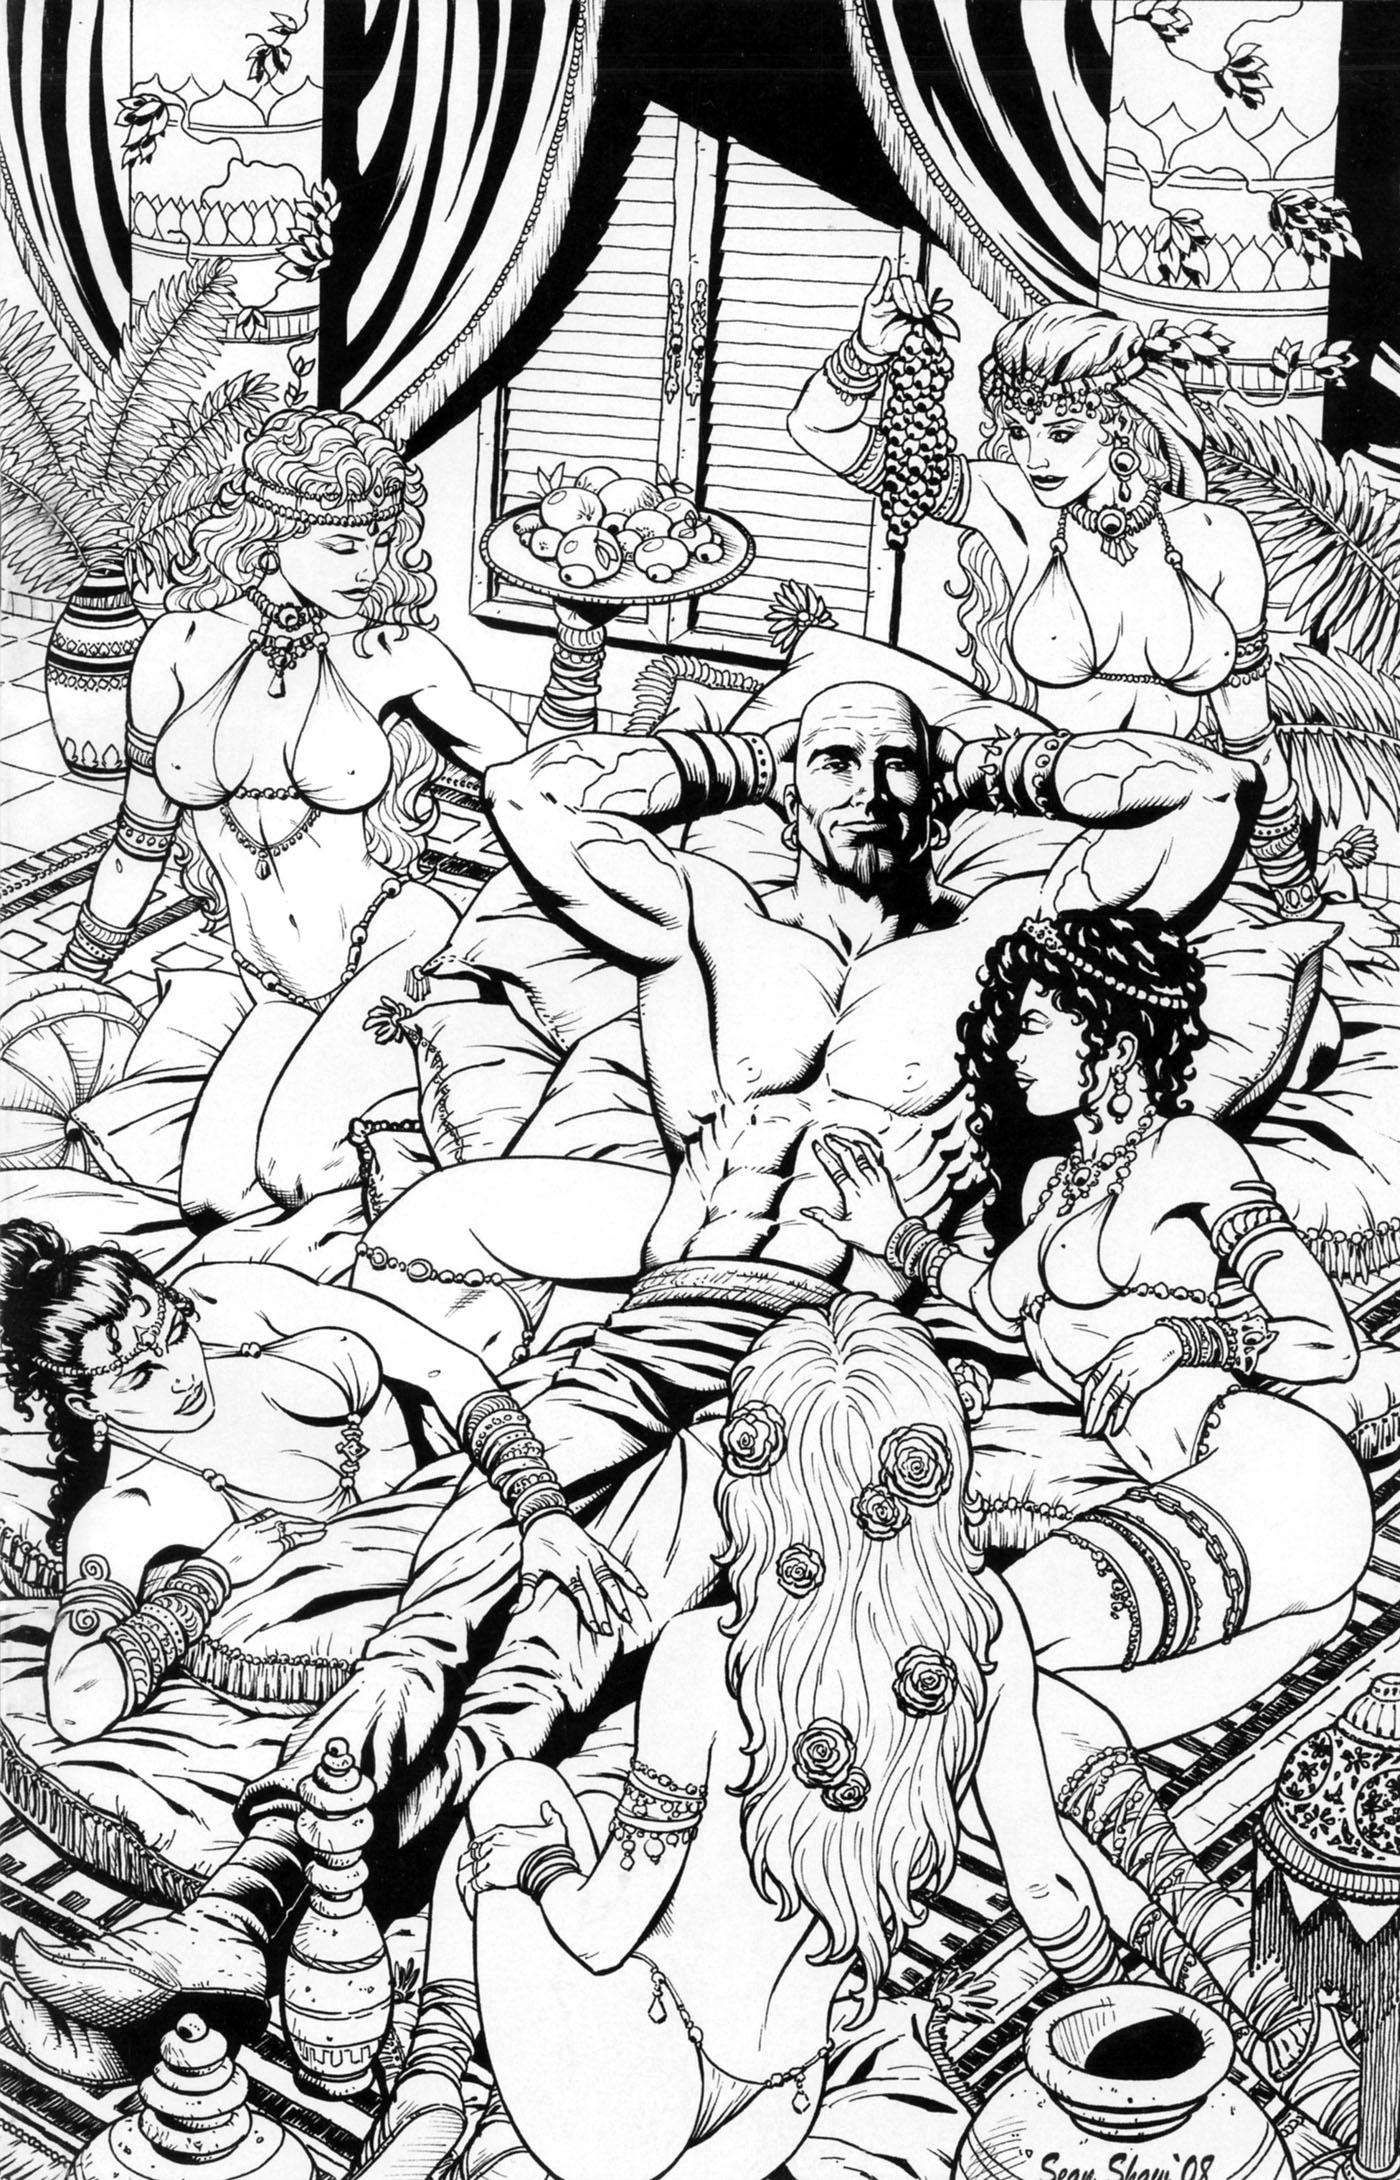 Read online 1001 Arabian Nights: The Adventures of Sinbad comic -  Issue #2 - 4